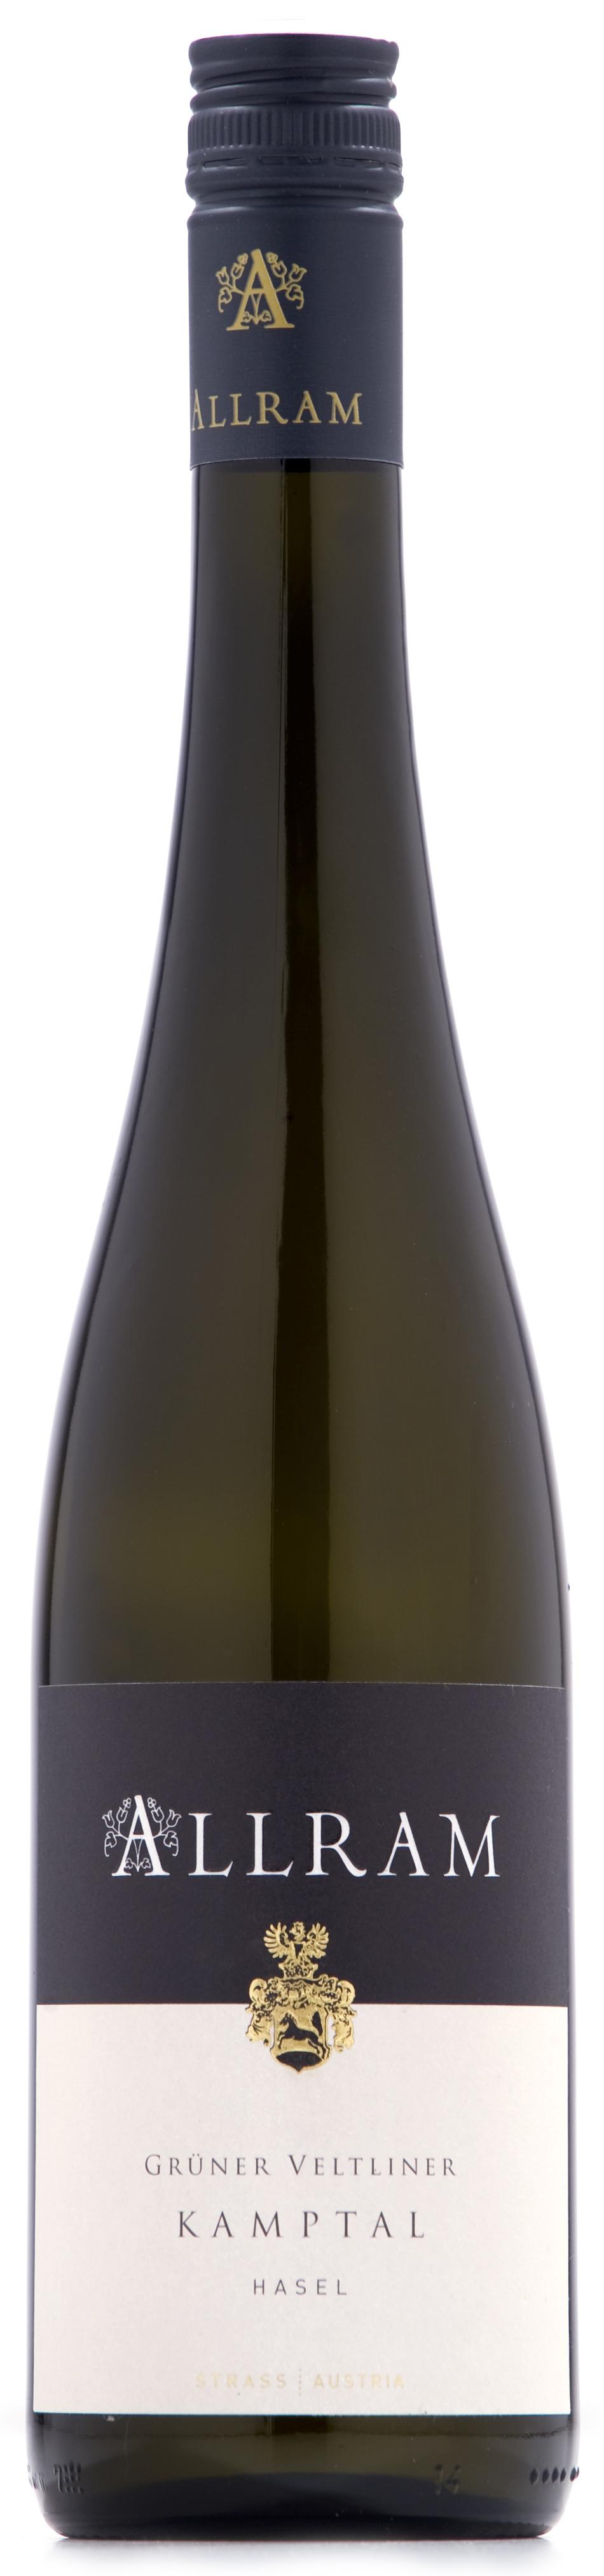 Weingut Allram Grüner Veltliner, Hasel